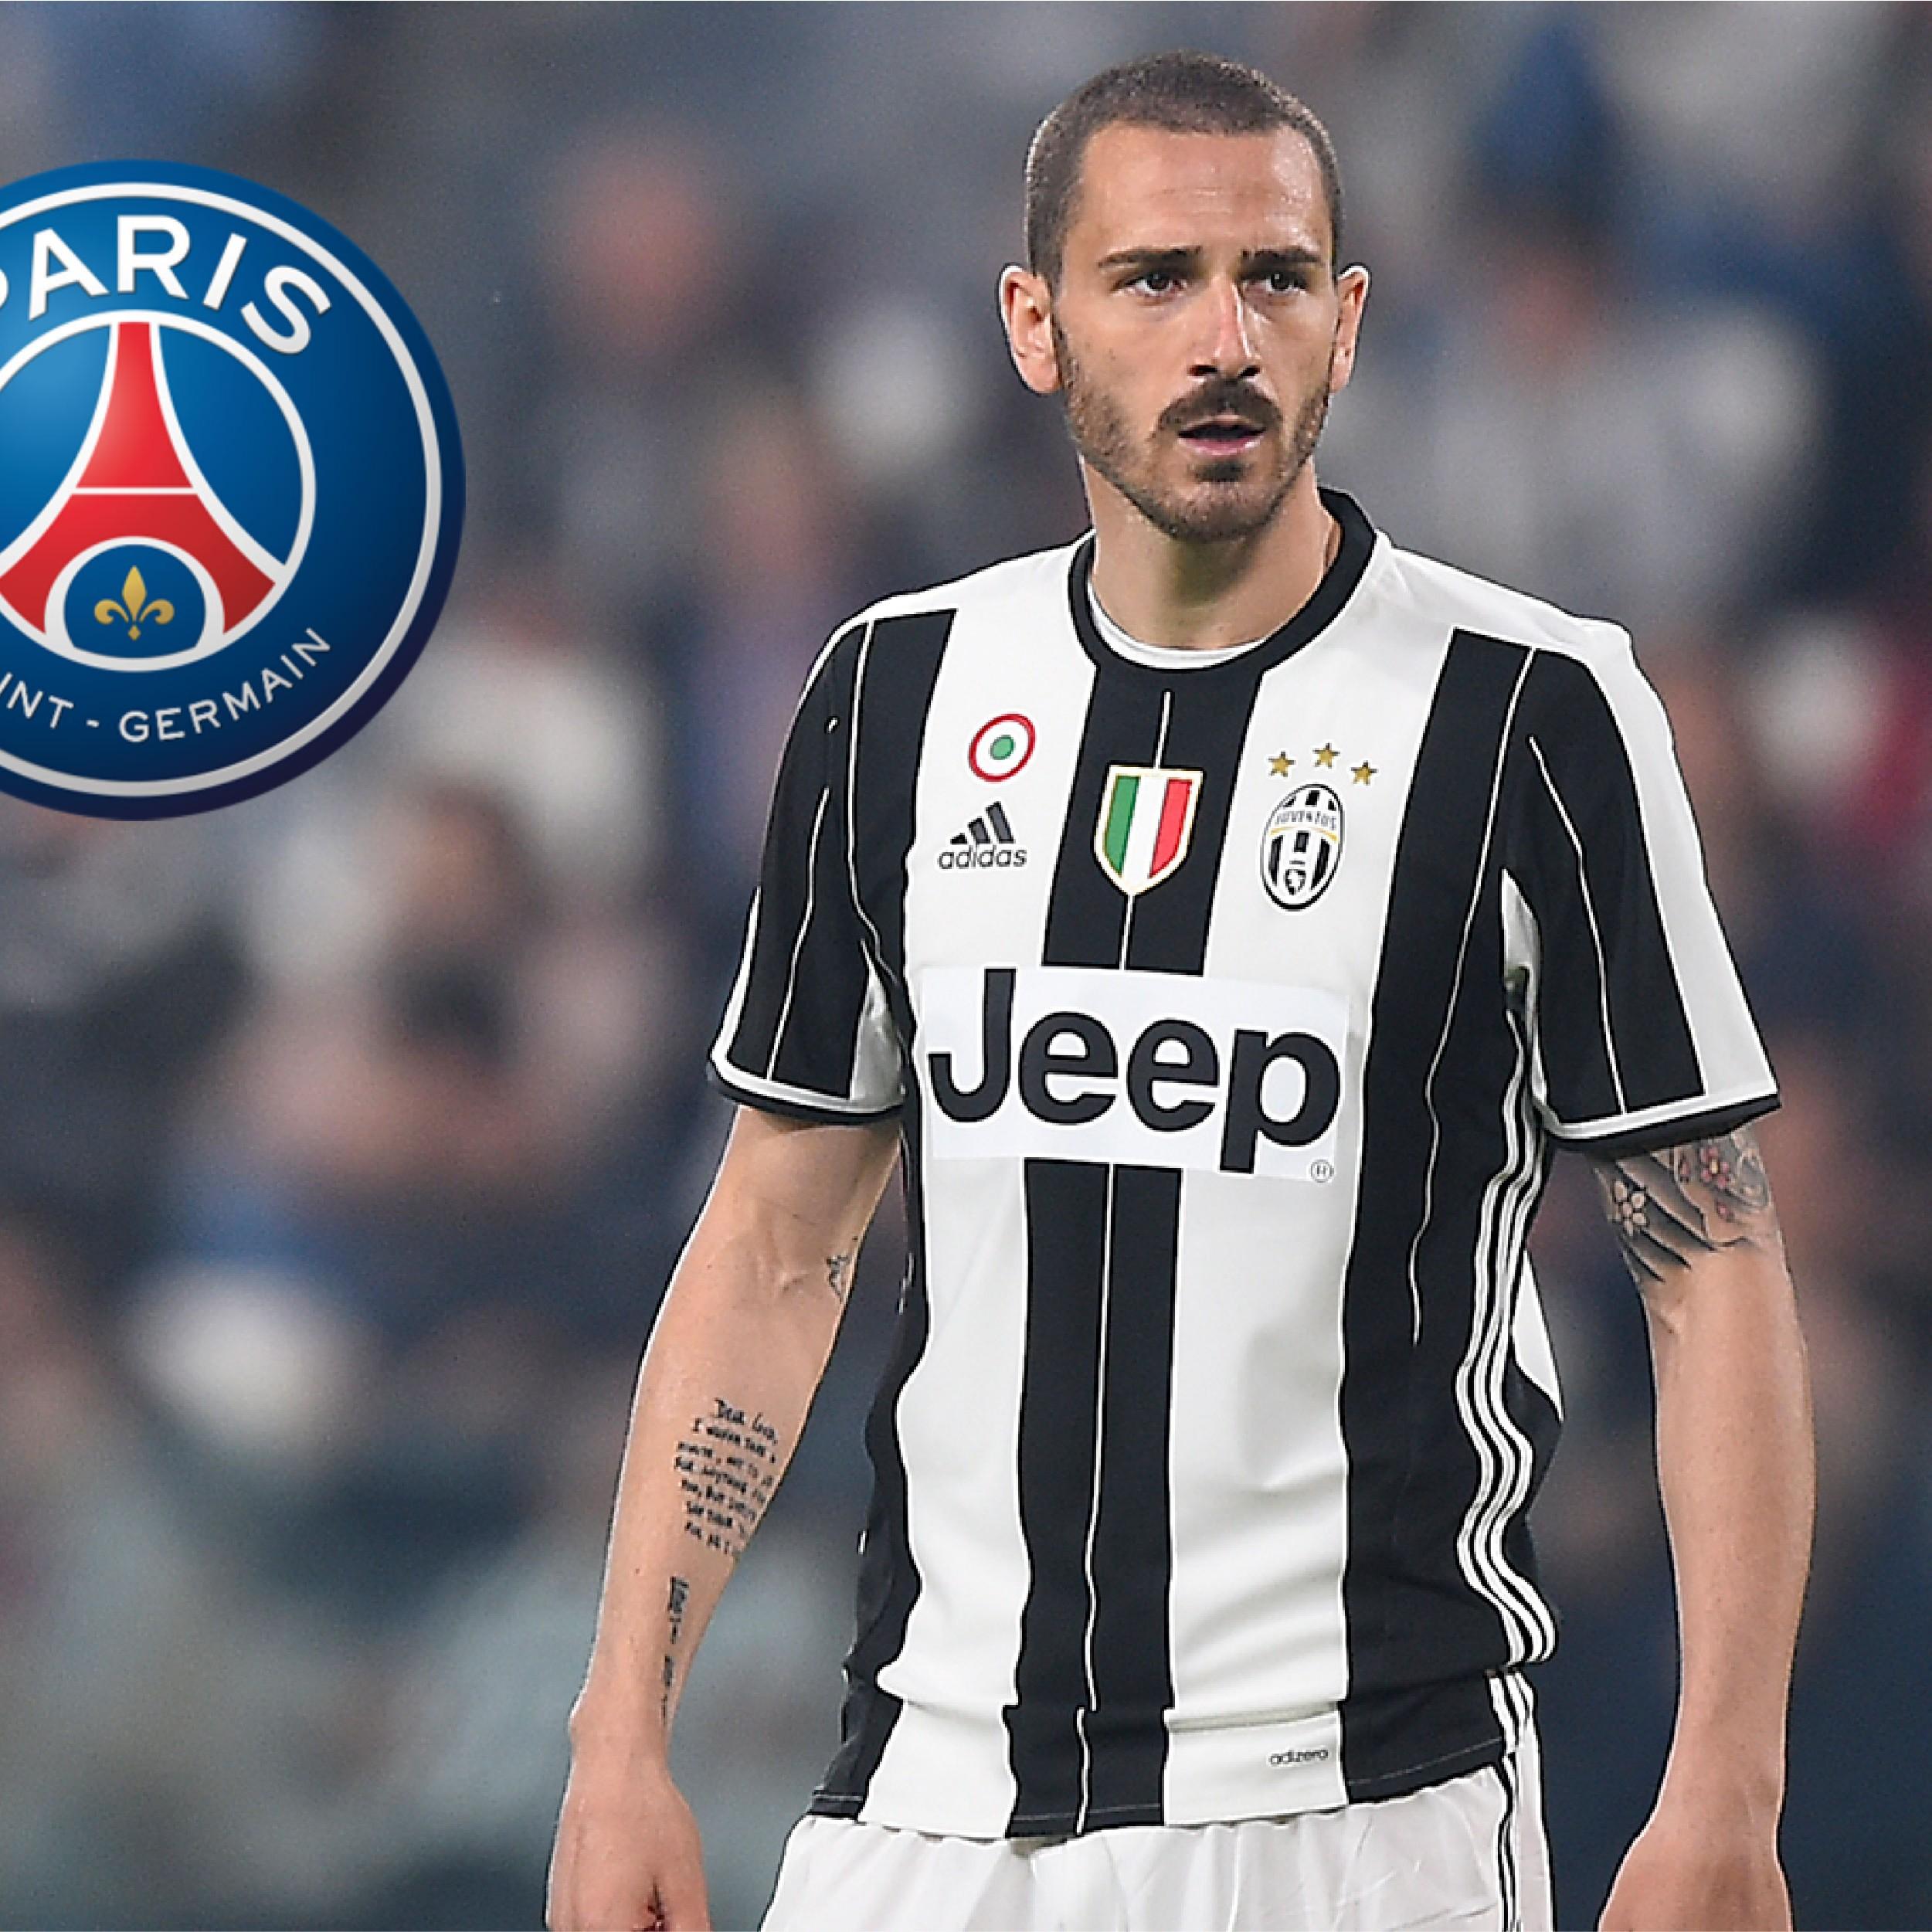 PSG quan tâm đến Bonucci